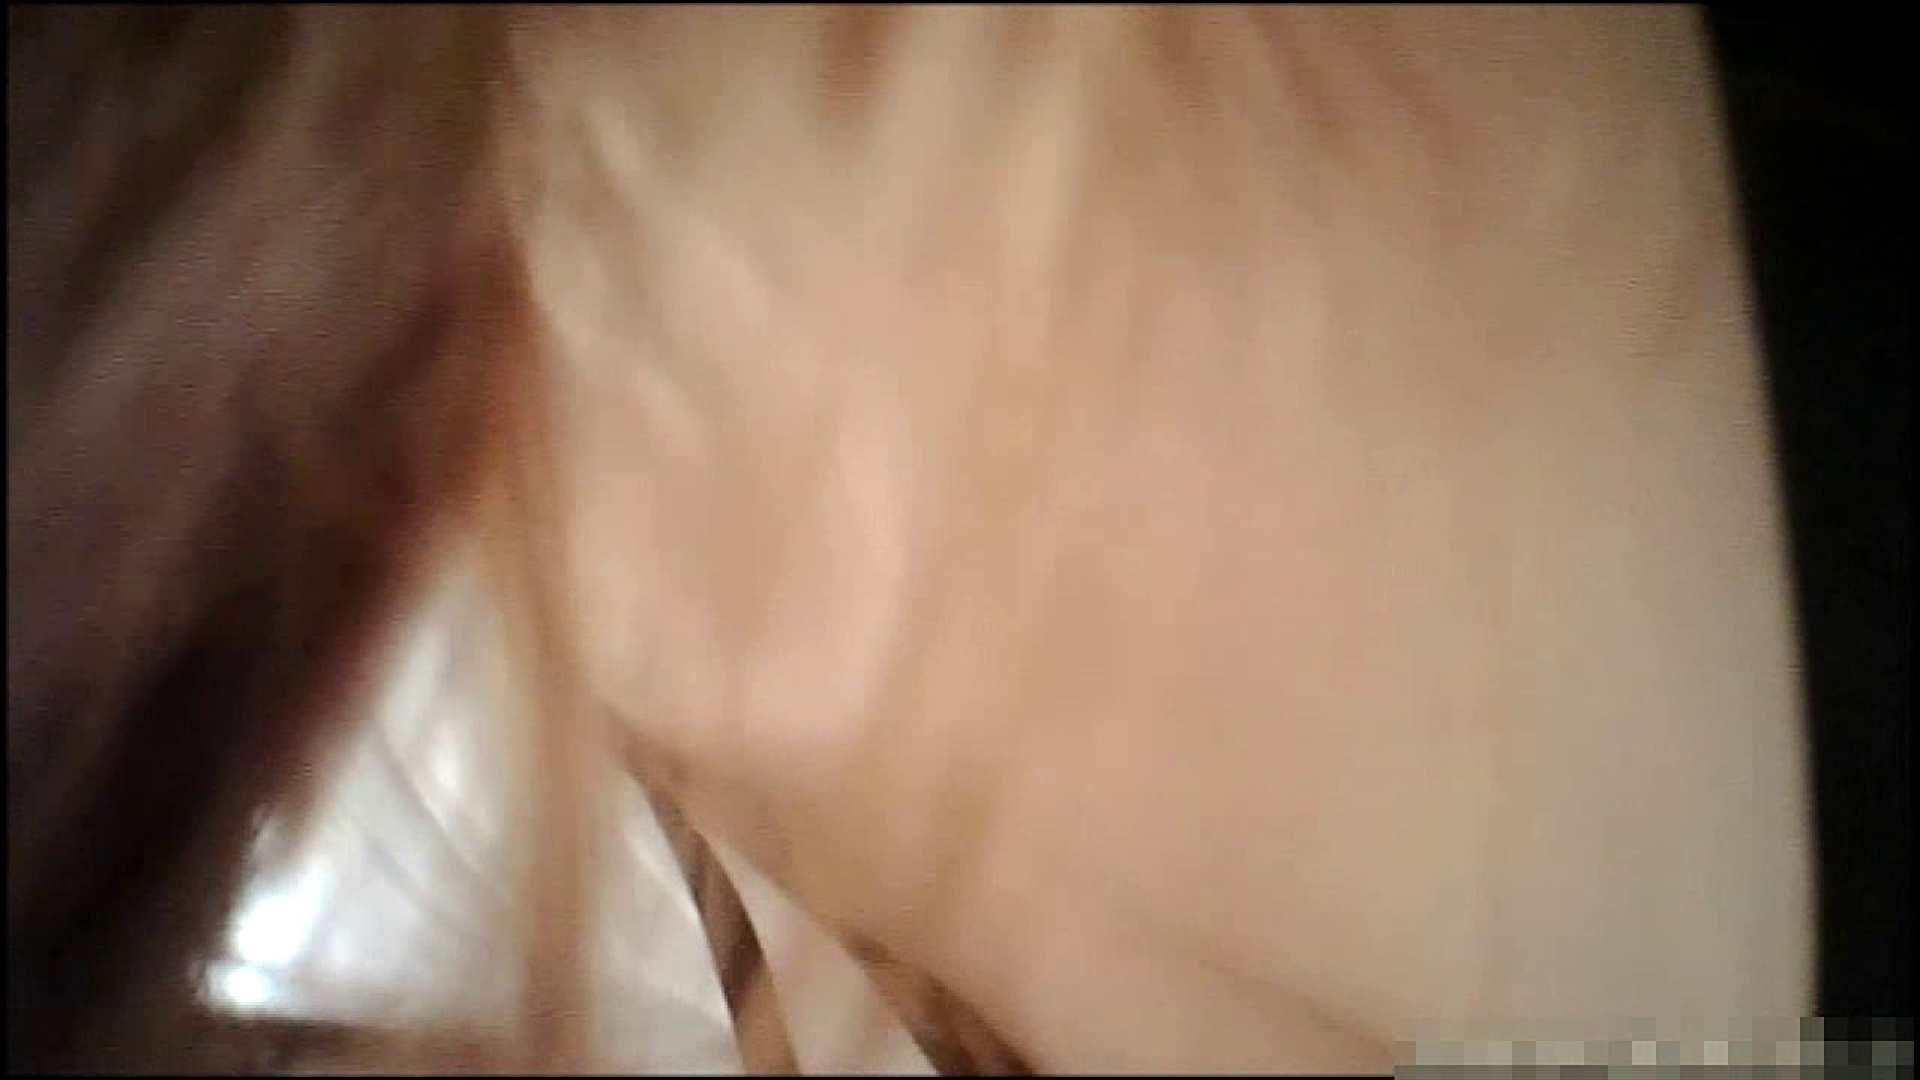 NO.2 高飛車でプライドの高い友人【某ファッションビル靴下屋】 美乳 スケベ動画紹介 86画像 38